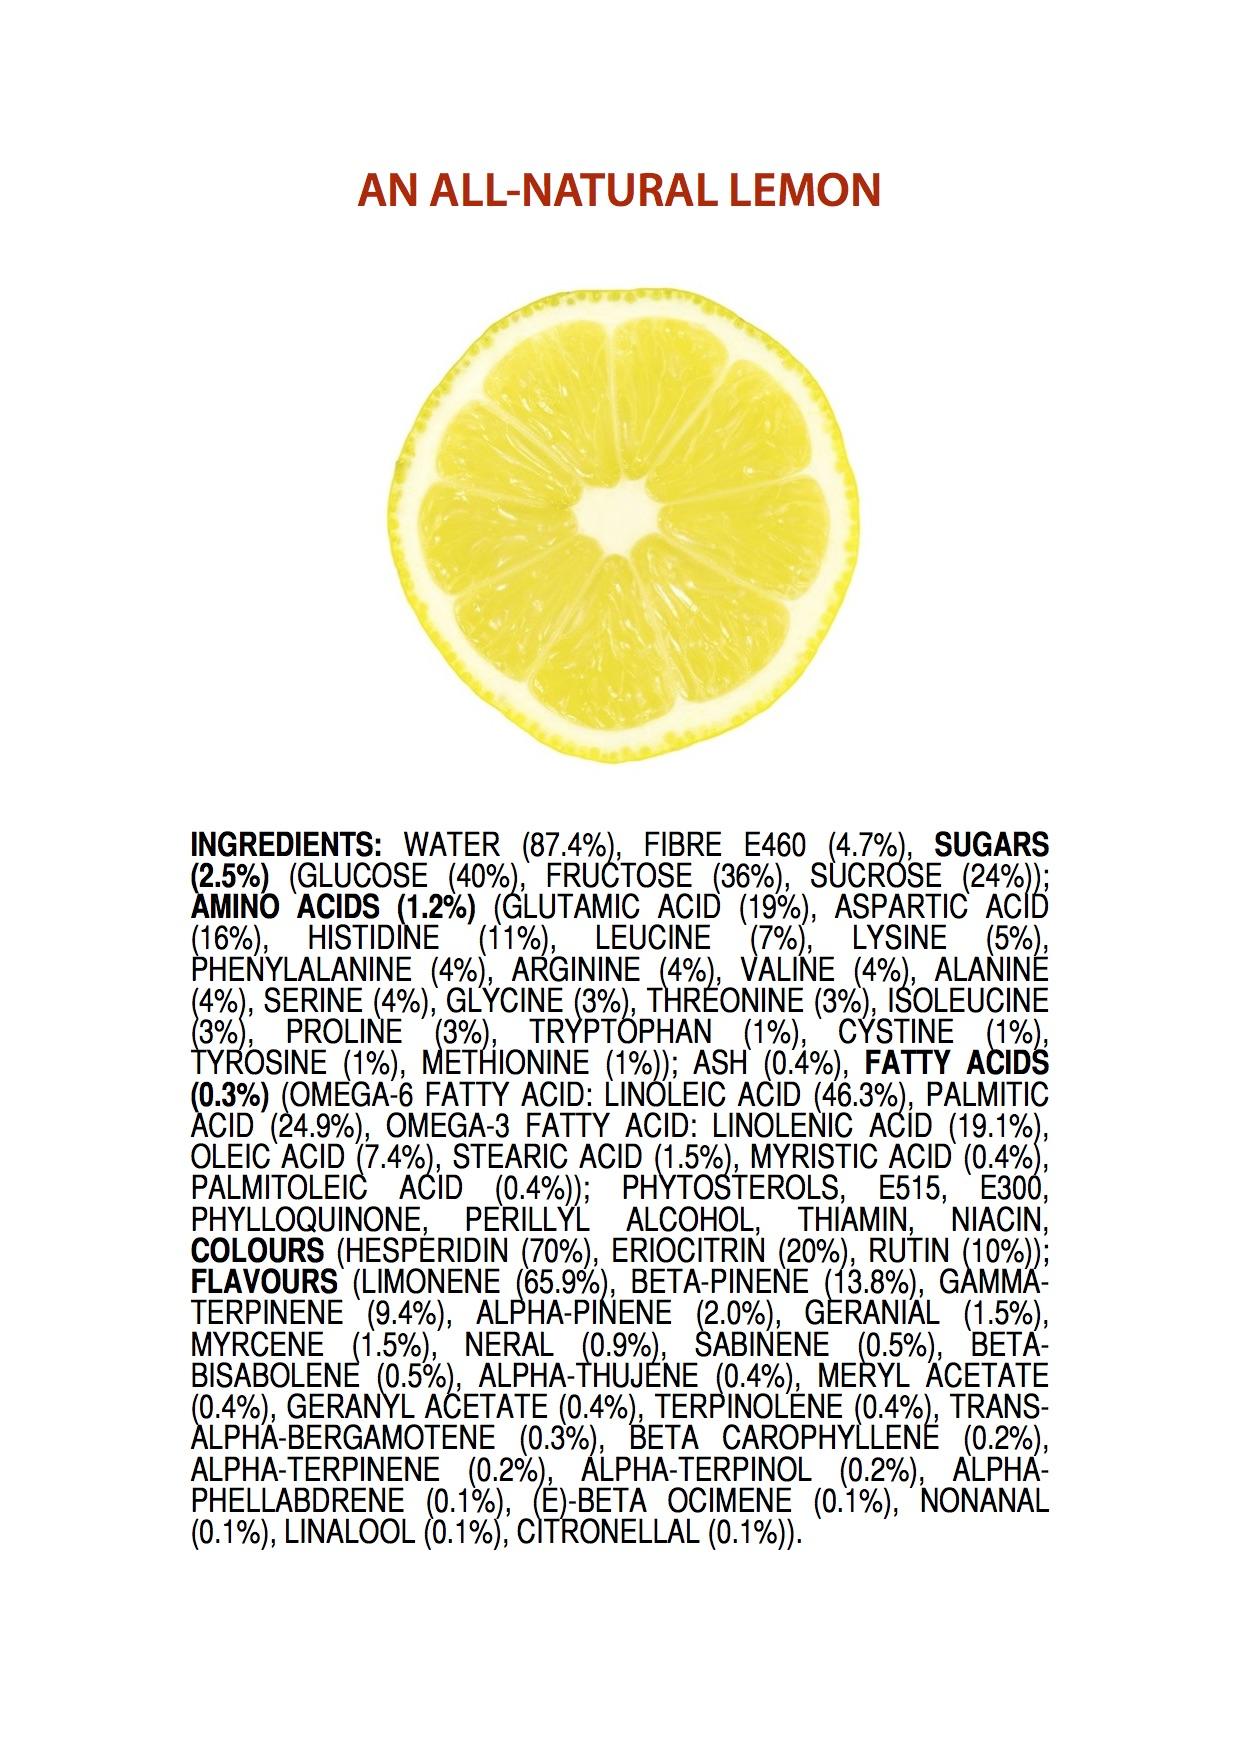 All Natural Princess Play Makeup Kit: Ingredients Of An All-Natural Lemon